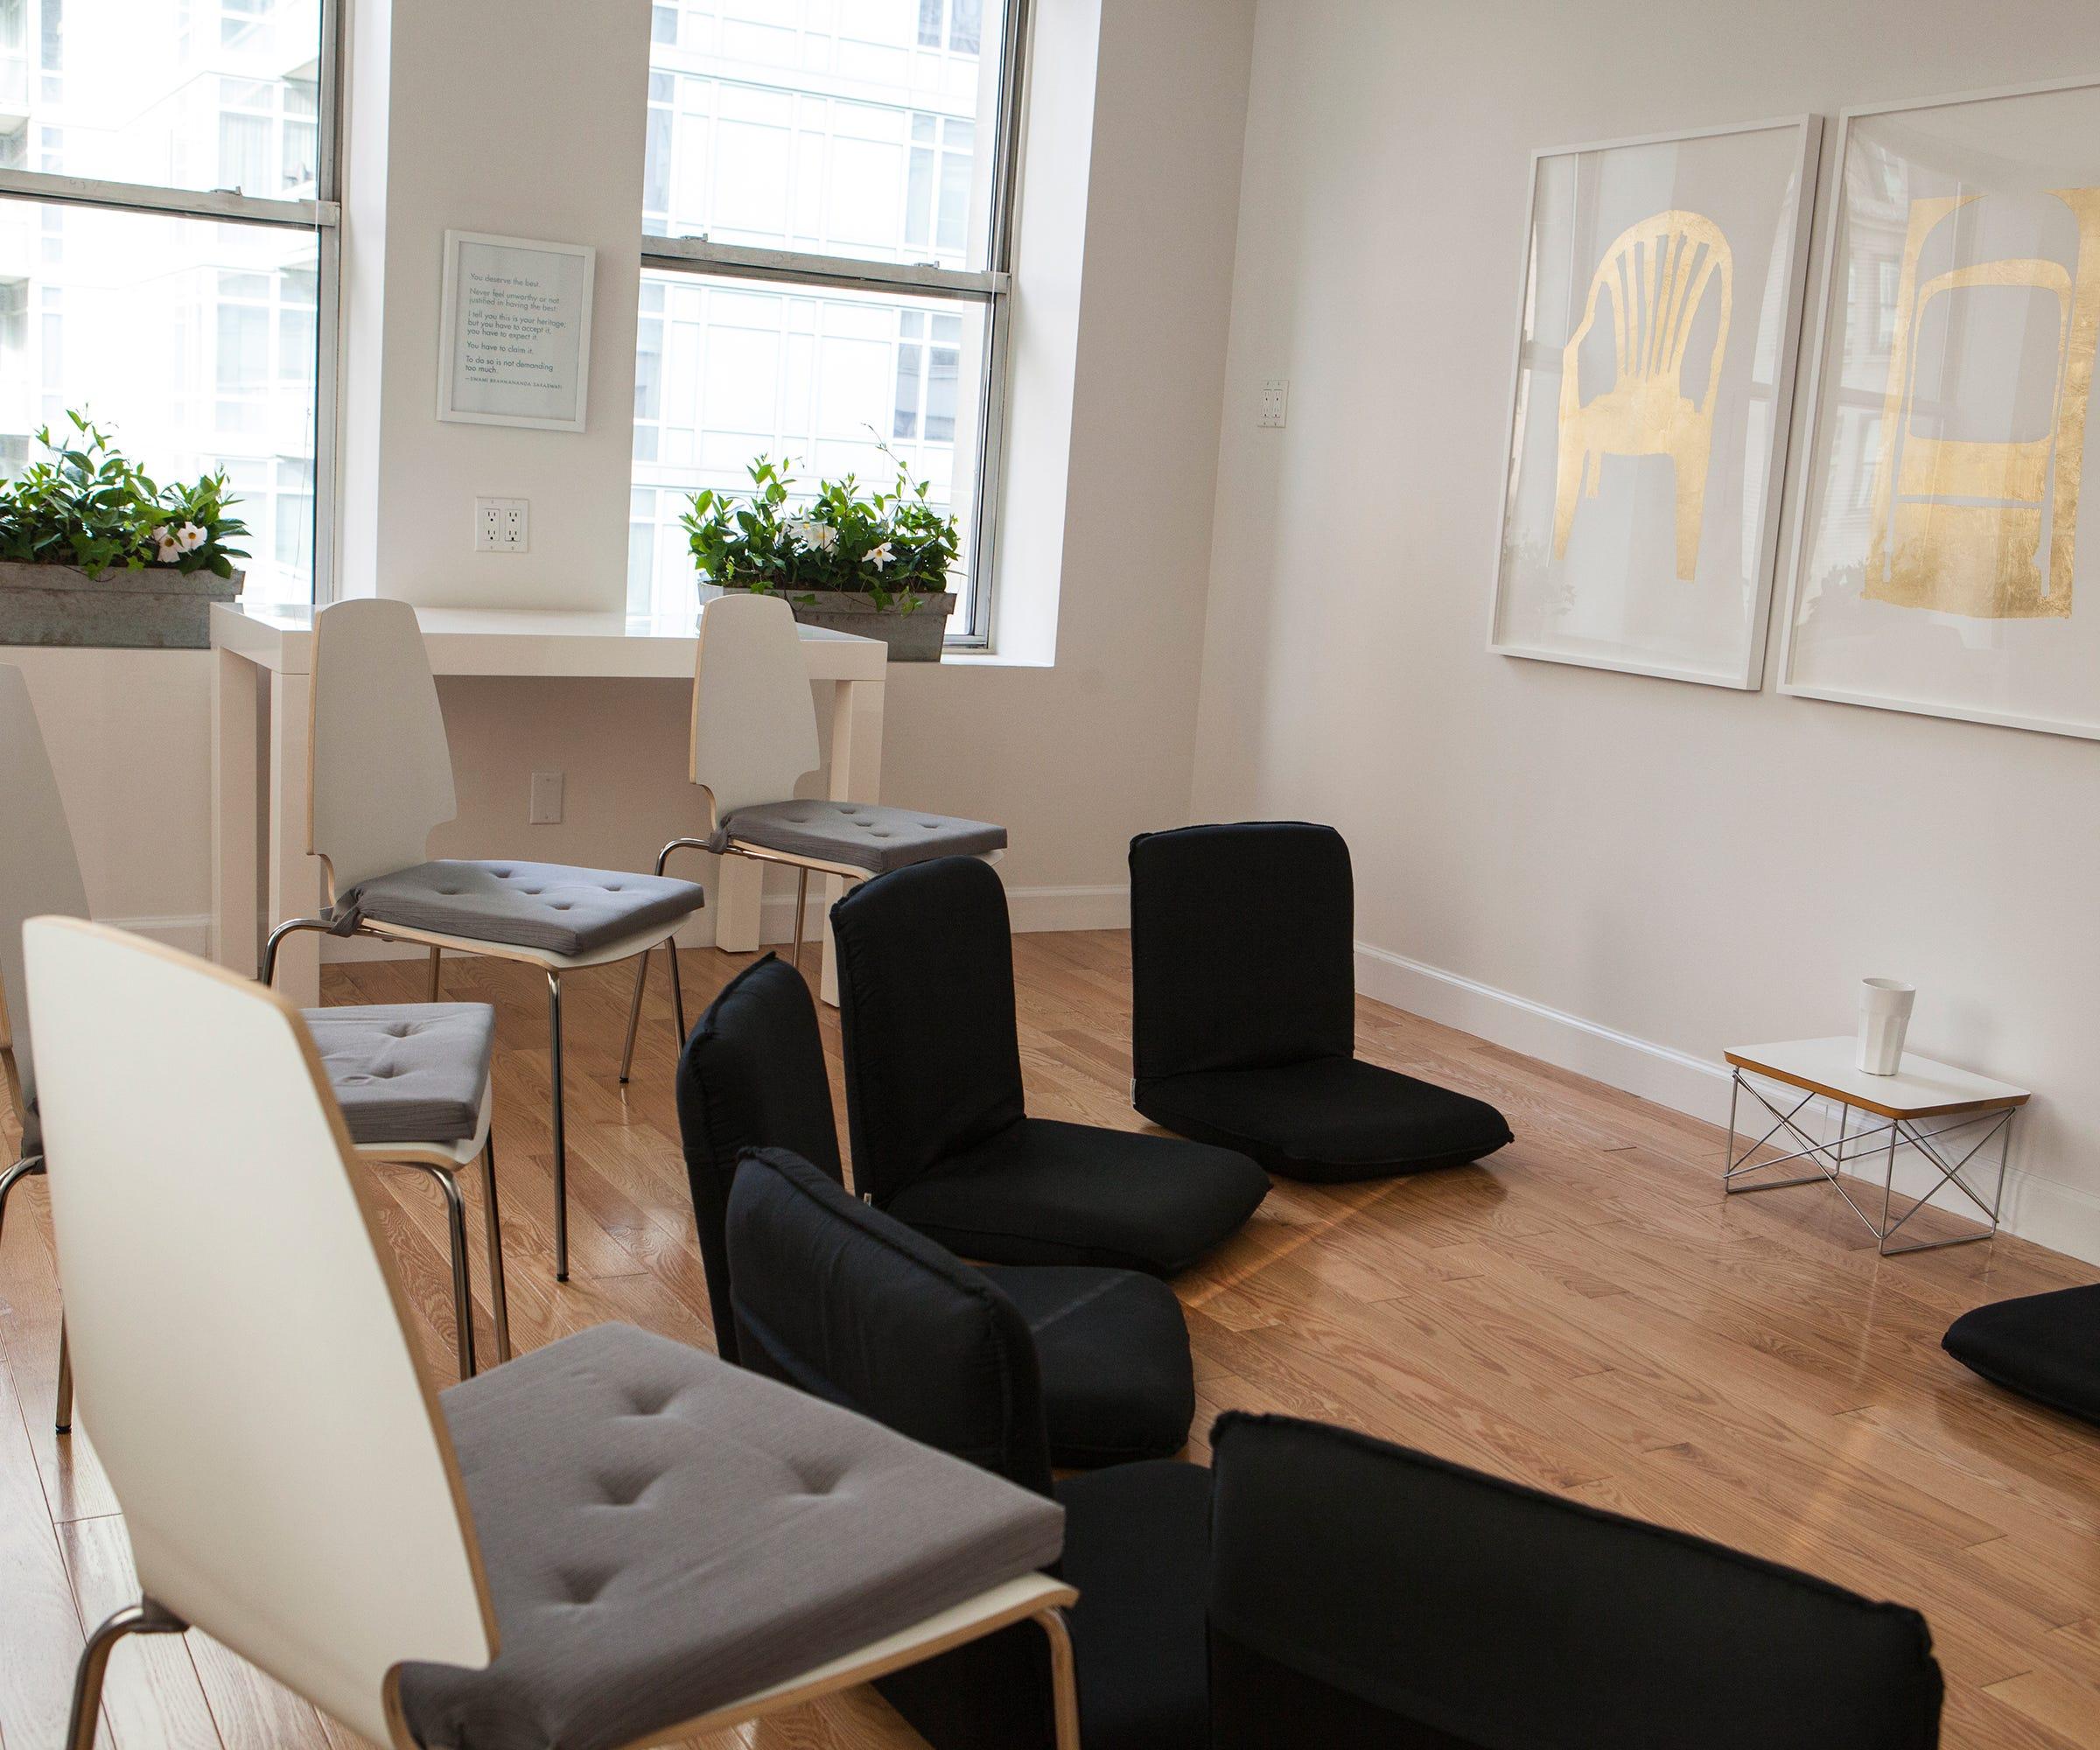 Best Meditation Classes NYC - Relaxing Wellness Studios